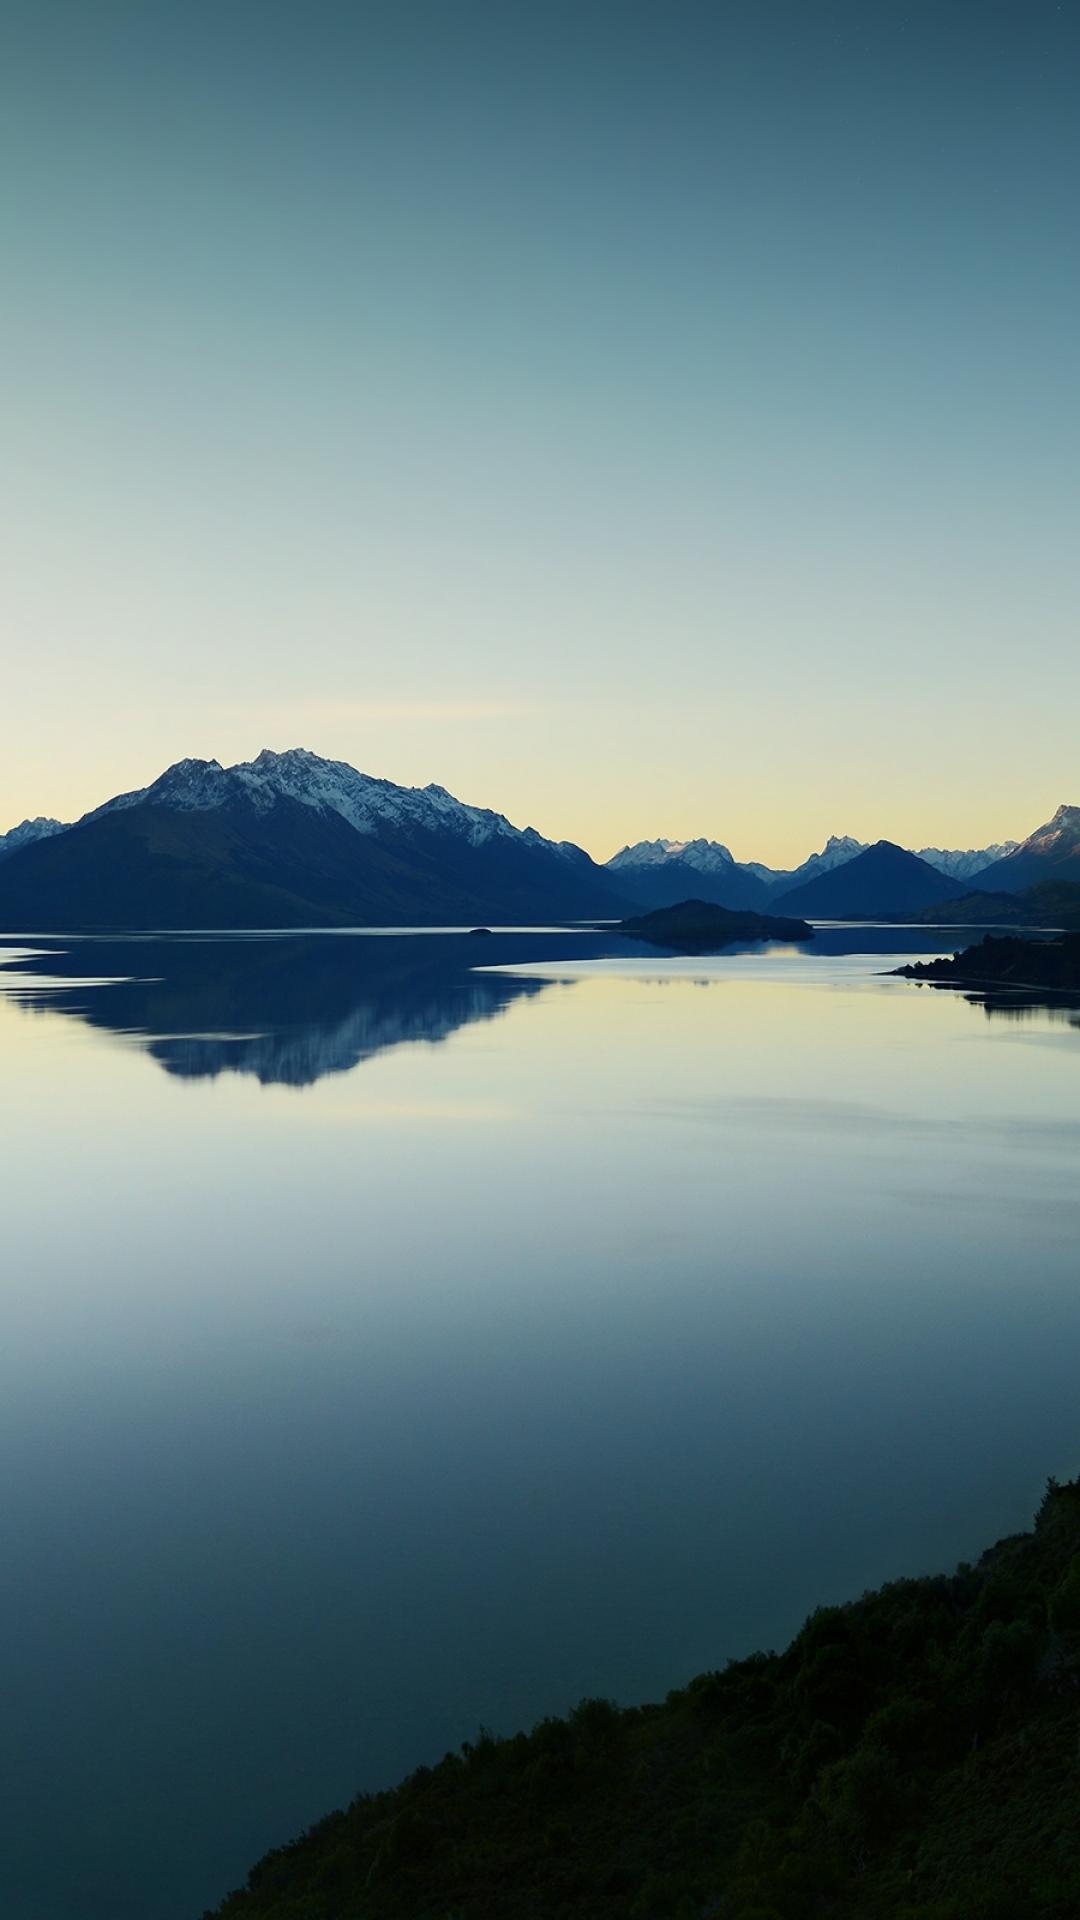 iPhone wallpaper 3wallpapers lake sky evening Lake